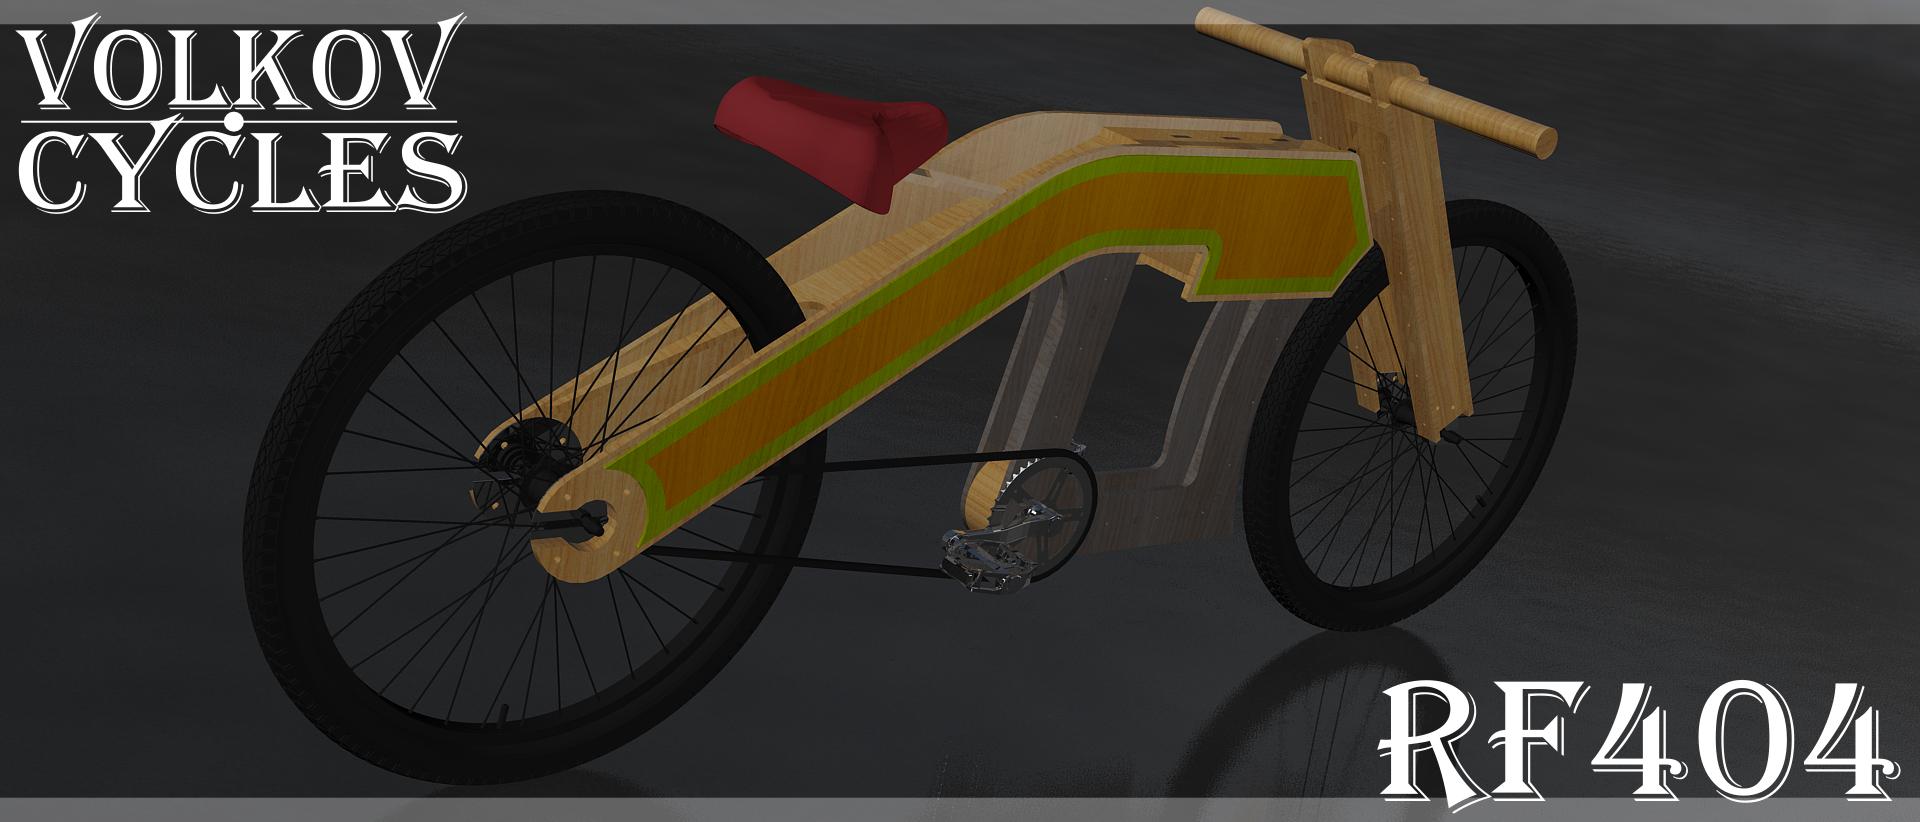 Volkov Cycles